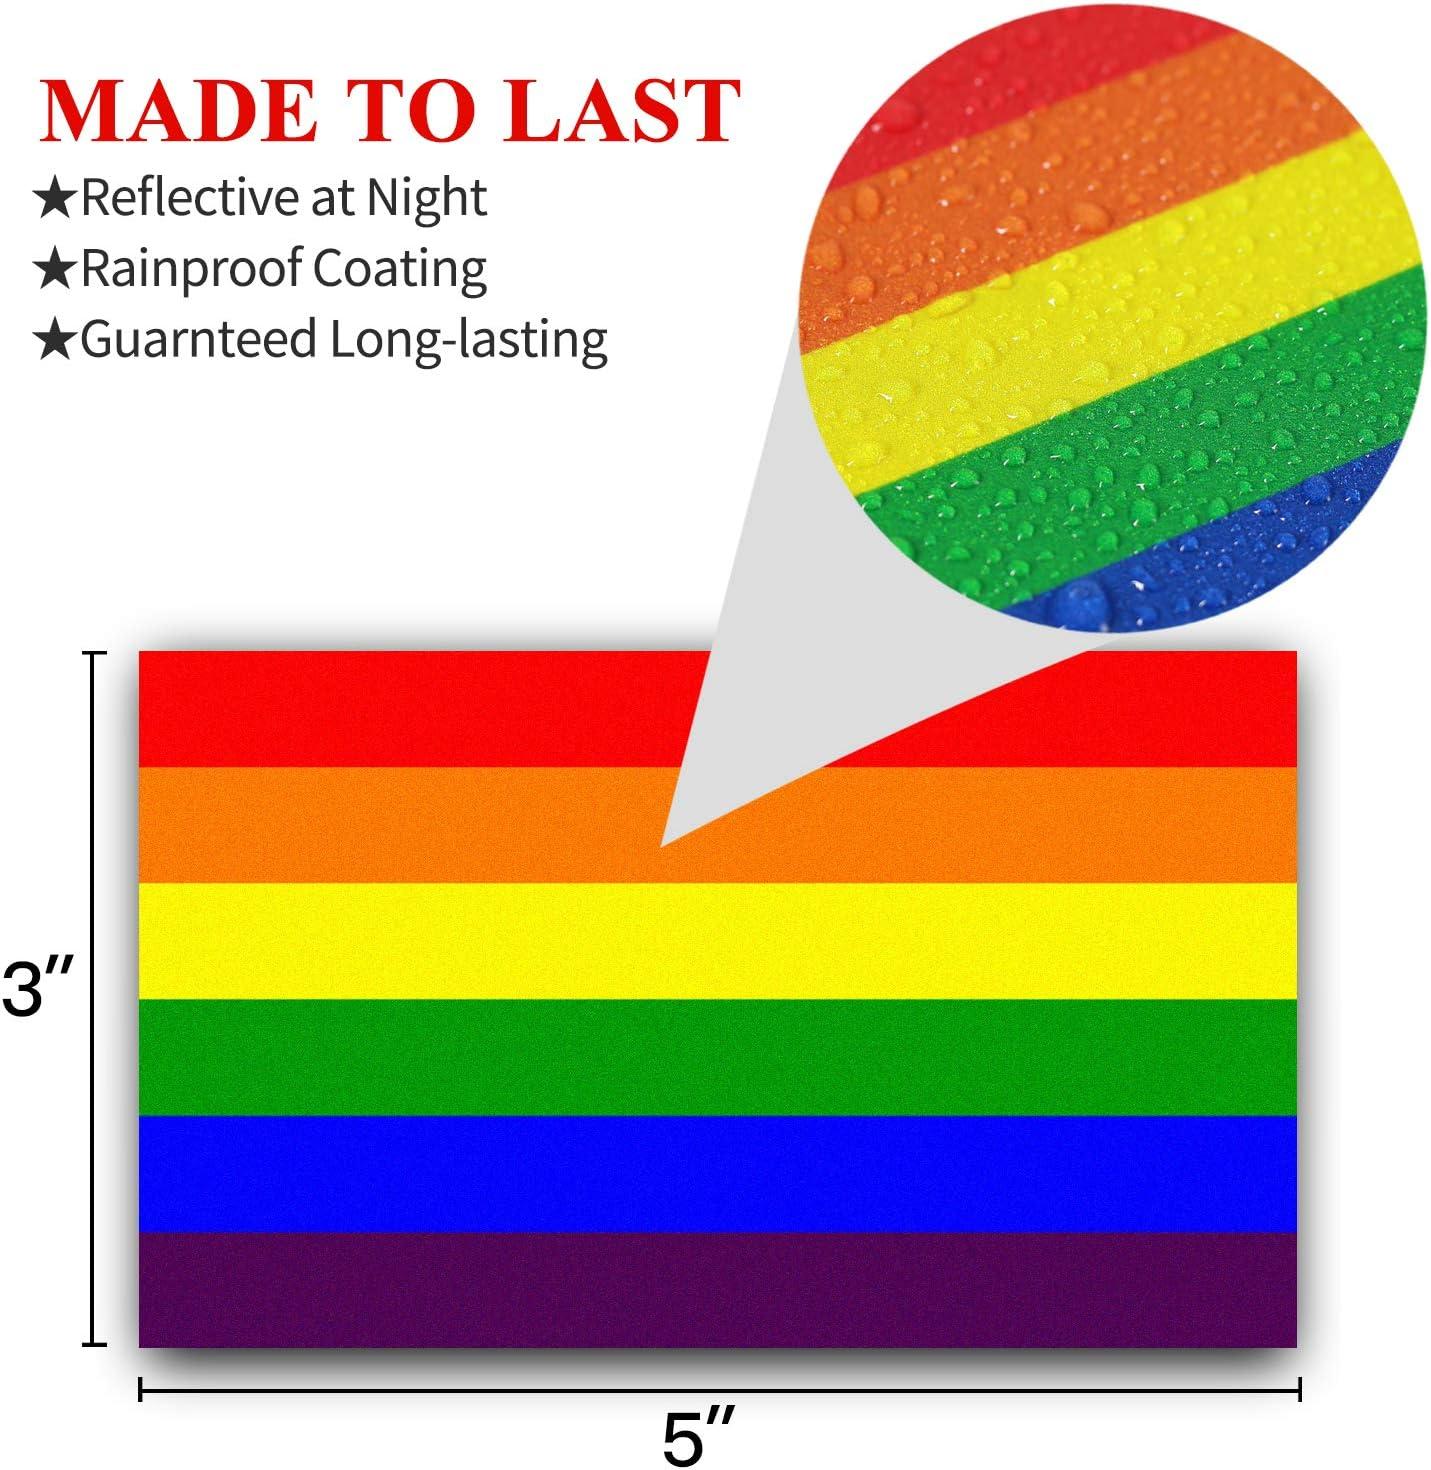 Transgender Pride 3er-Pack Lesbisch Anley LGBT Pride Aufkleber reflektierende Autoaufkleber Bisexual 12,7 x 7,6 cm Regenbogen-Flagge